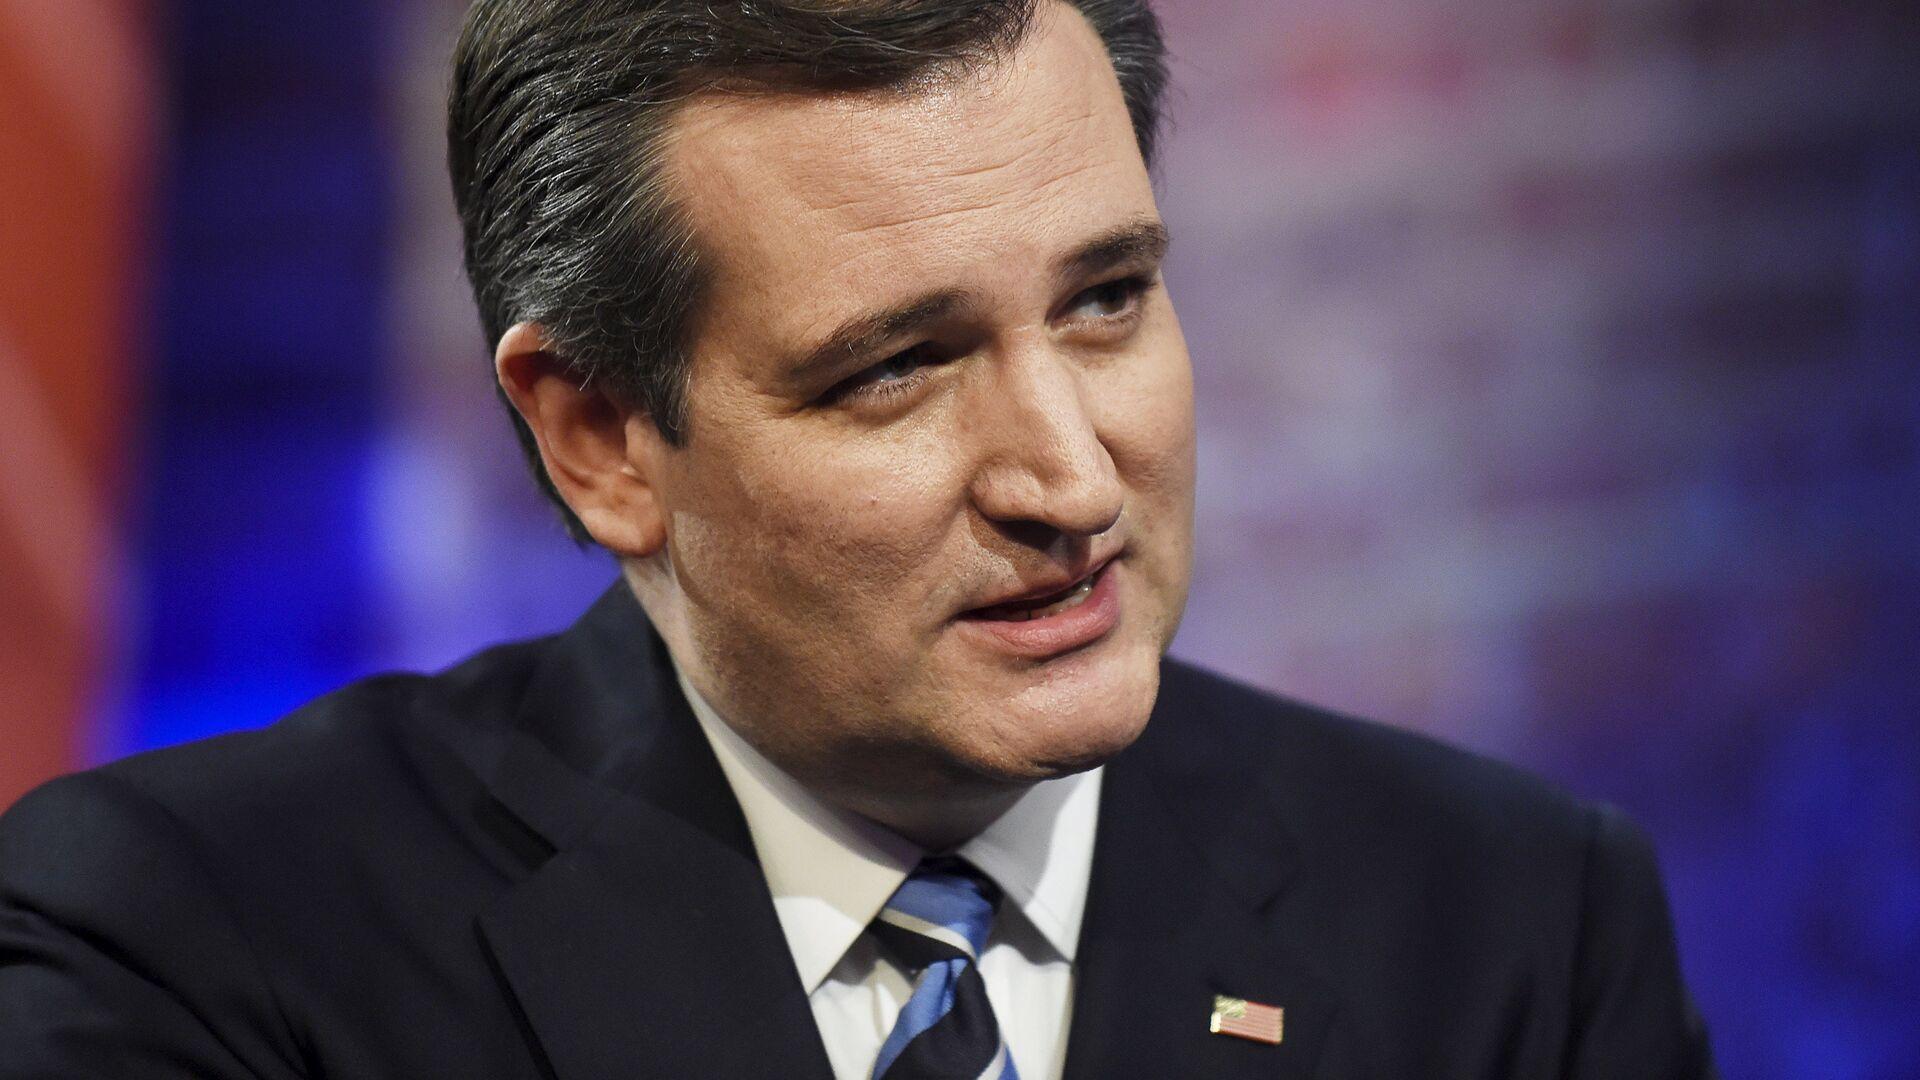 Ted Cruz senador republicano por el estado de Texas - Sputnik Mundo, 1920, 24.02.2021